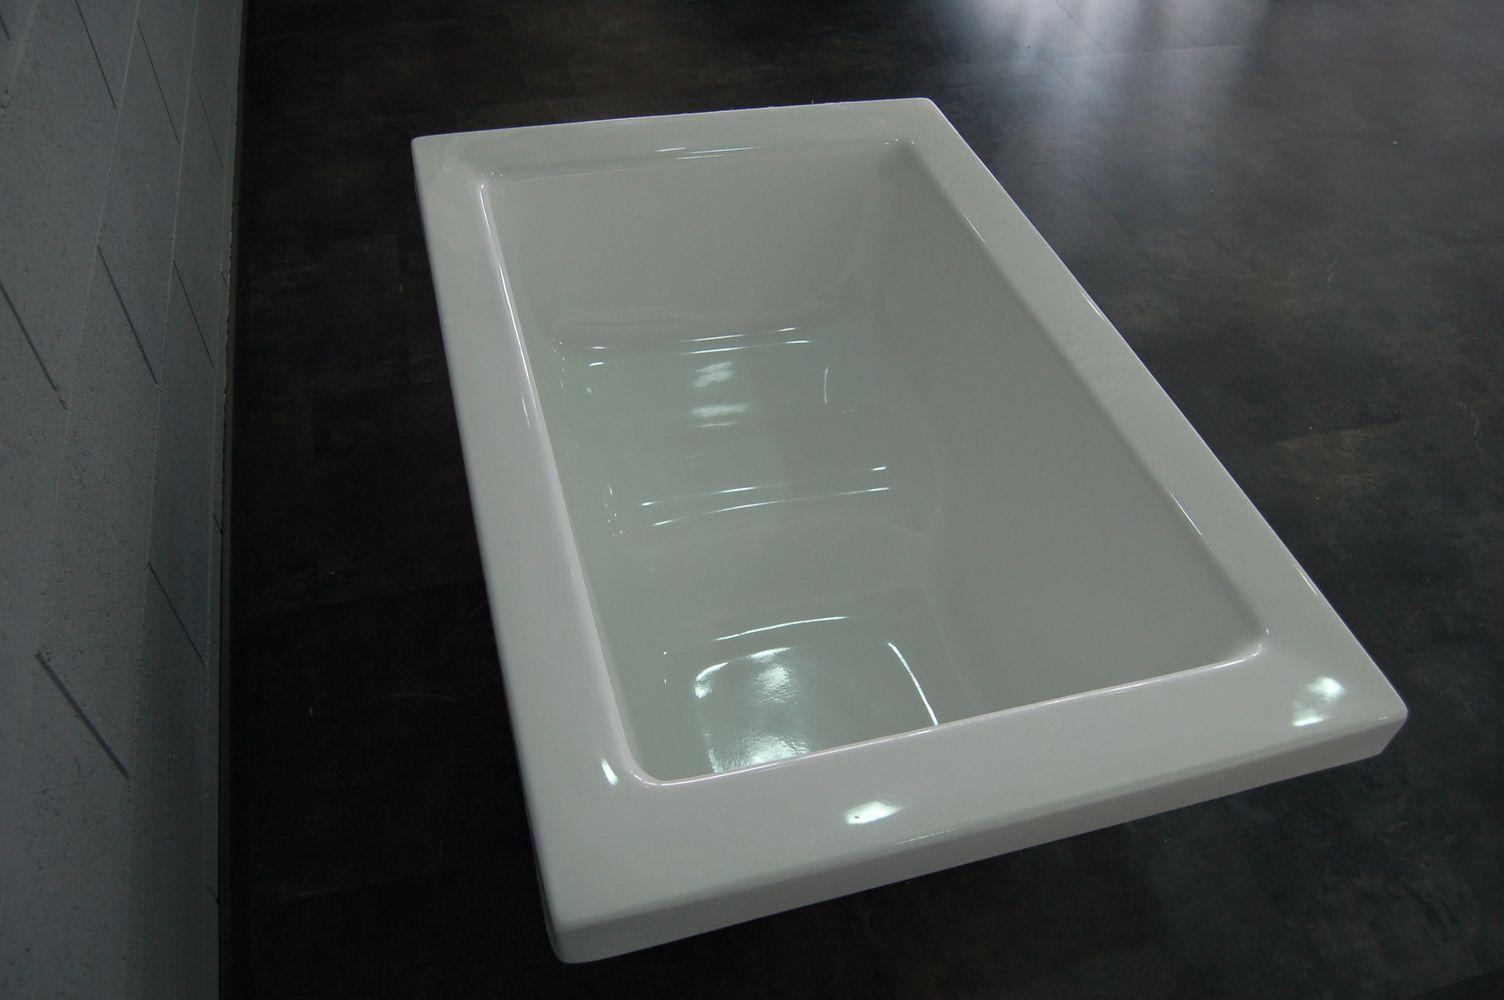 Vasca Da Bagno Dimensioni 140x70 : Misure vasca da bagno u idées de décoration arizonakeyguys